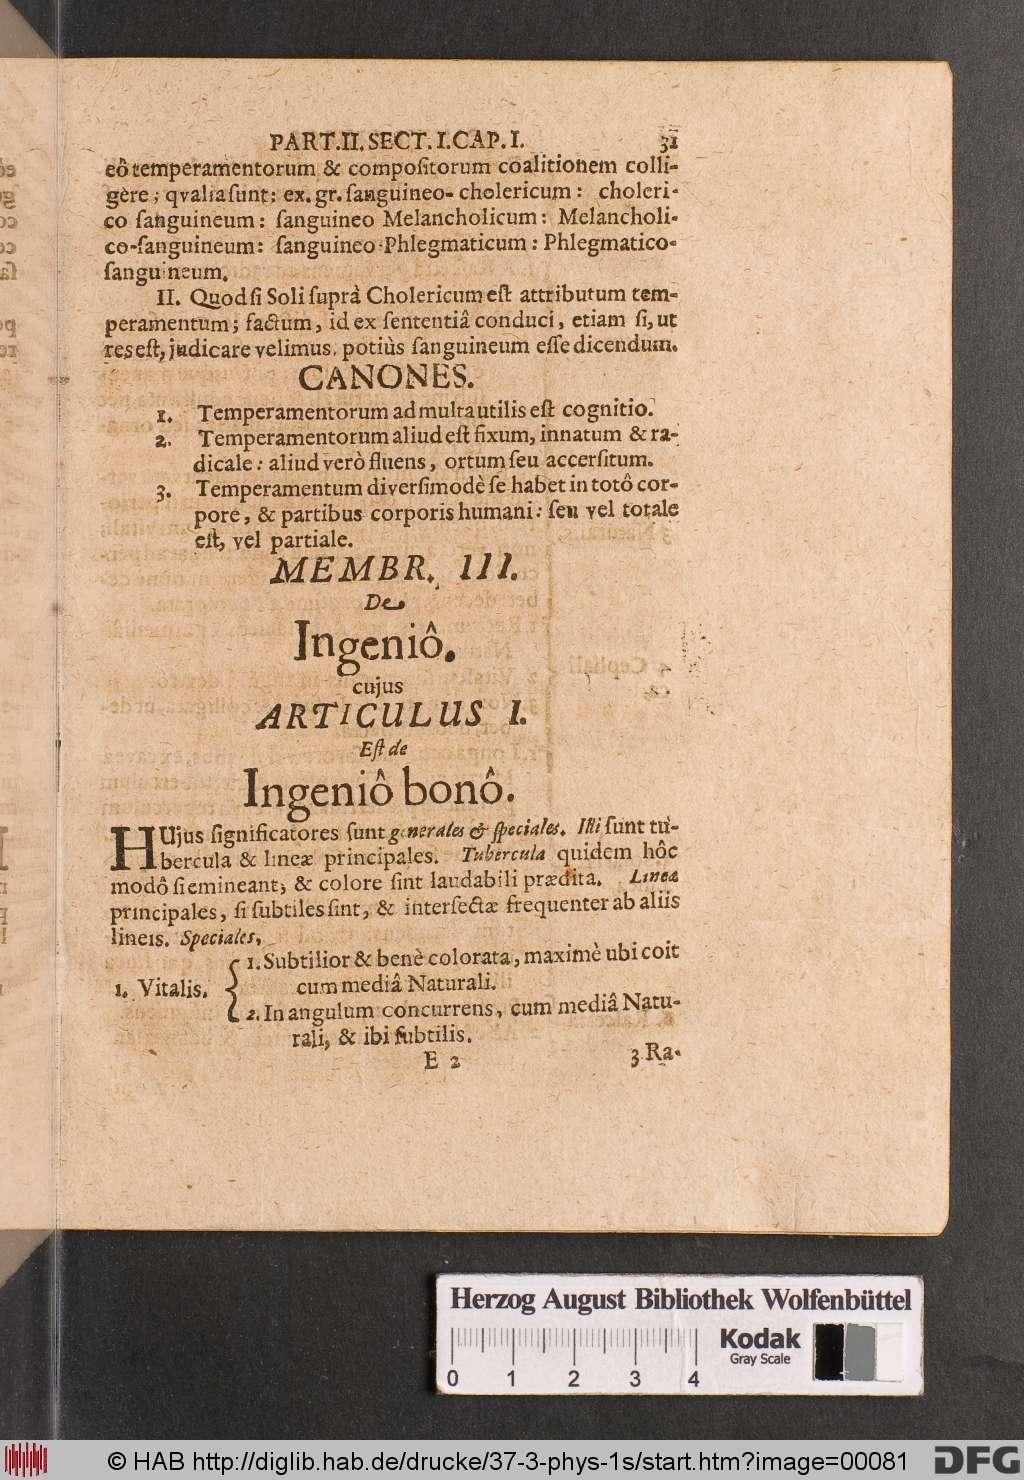 http://diglib.hab.de/drucke/37-3-phys-1s/00081.jpg